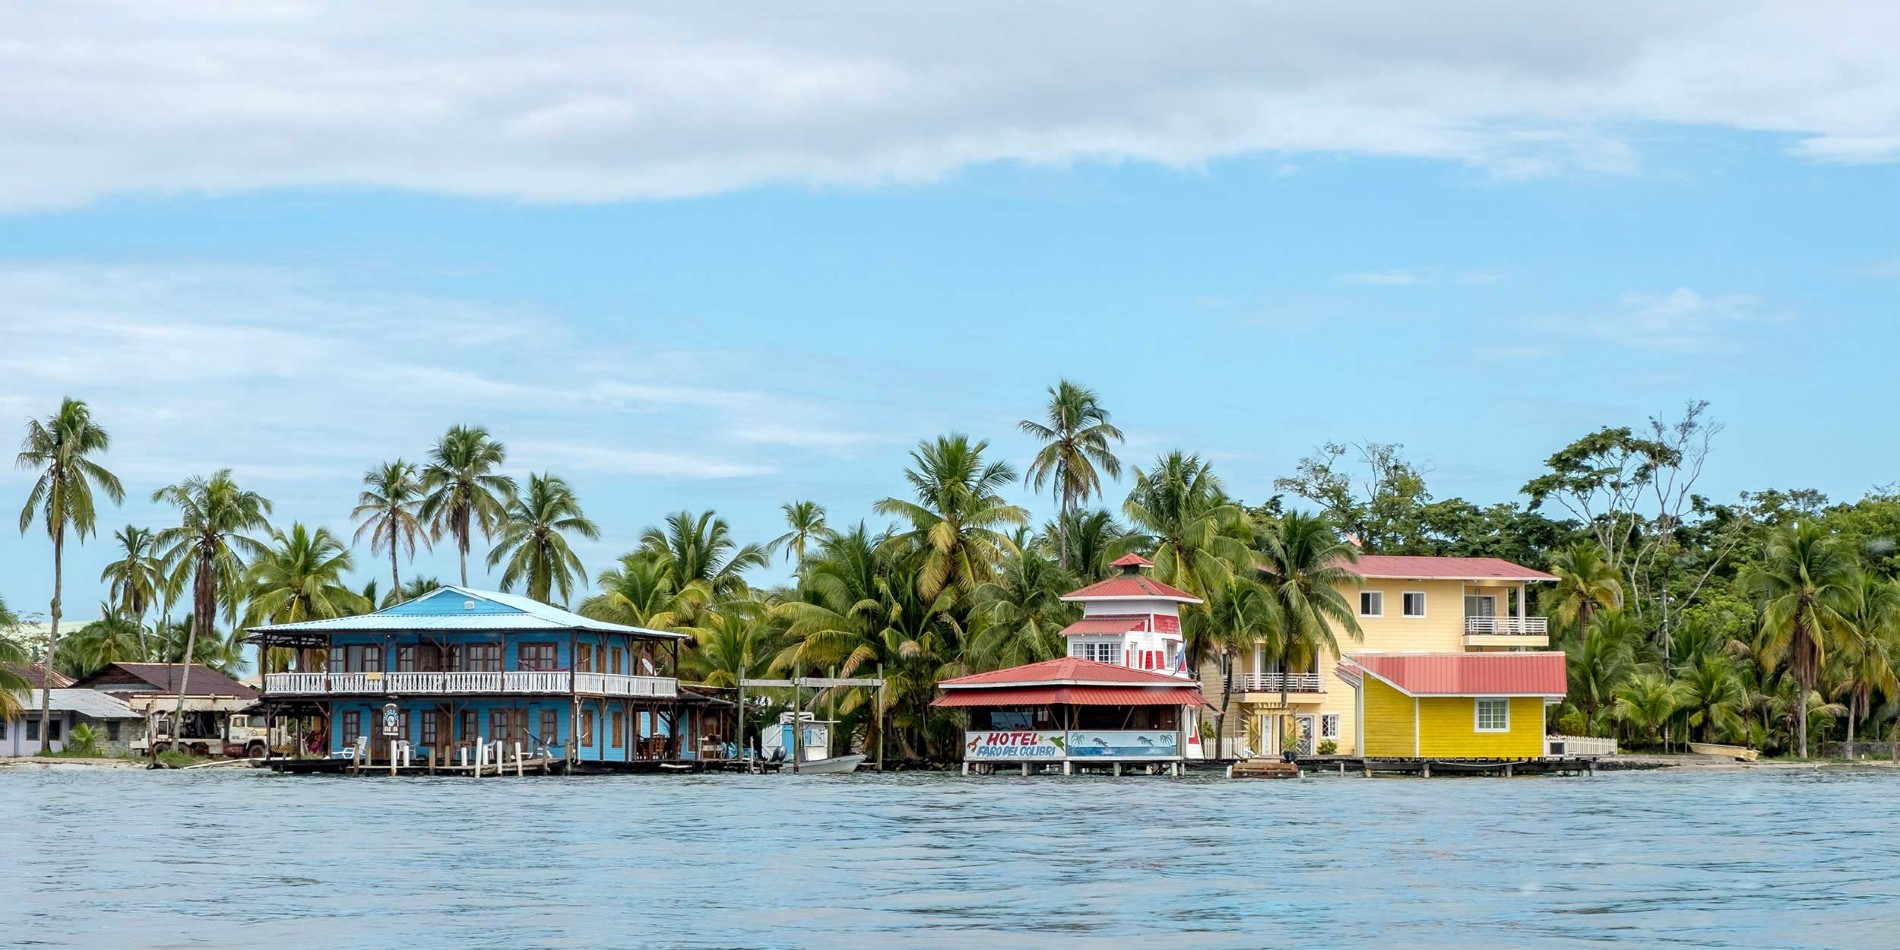 Bocas-del-Toro©AndreaKlaussner_2500x1250.jpg